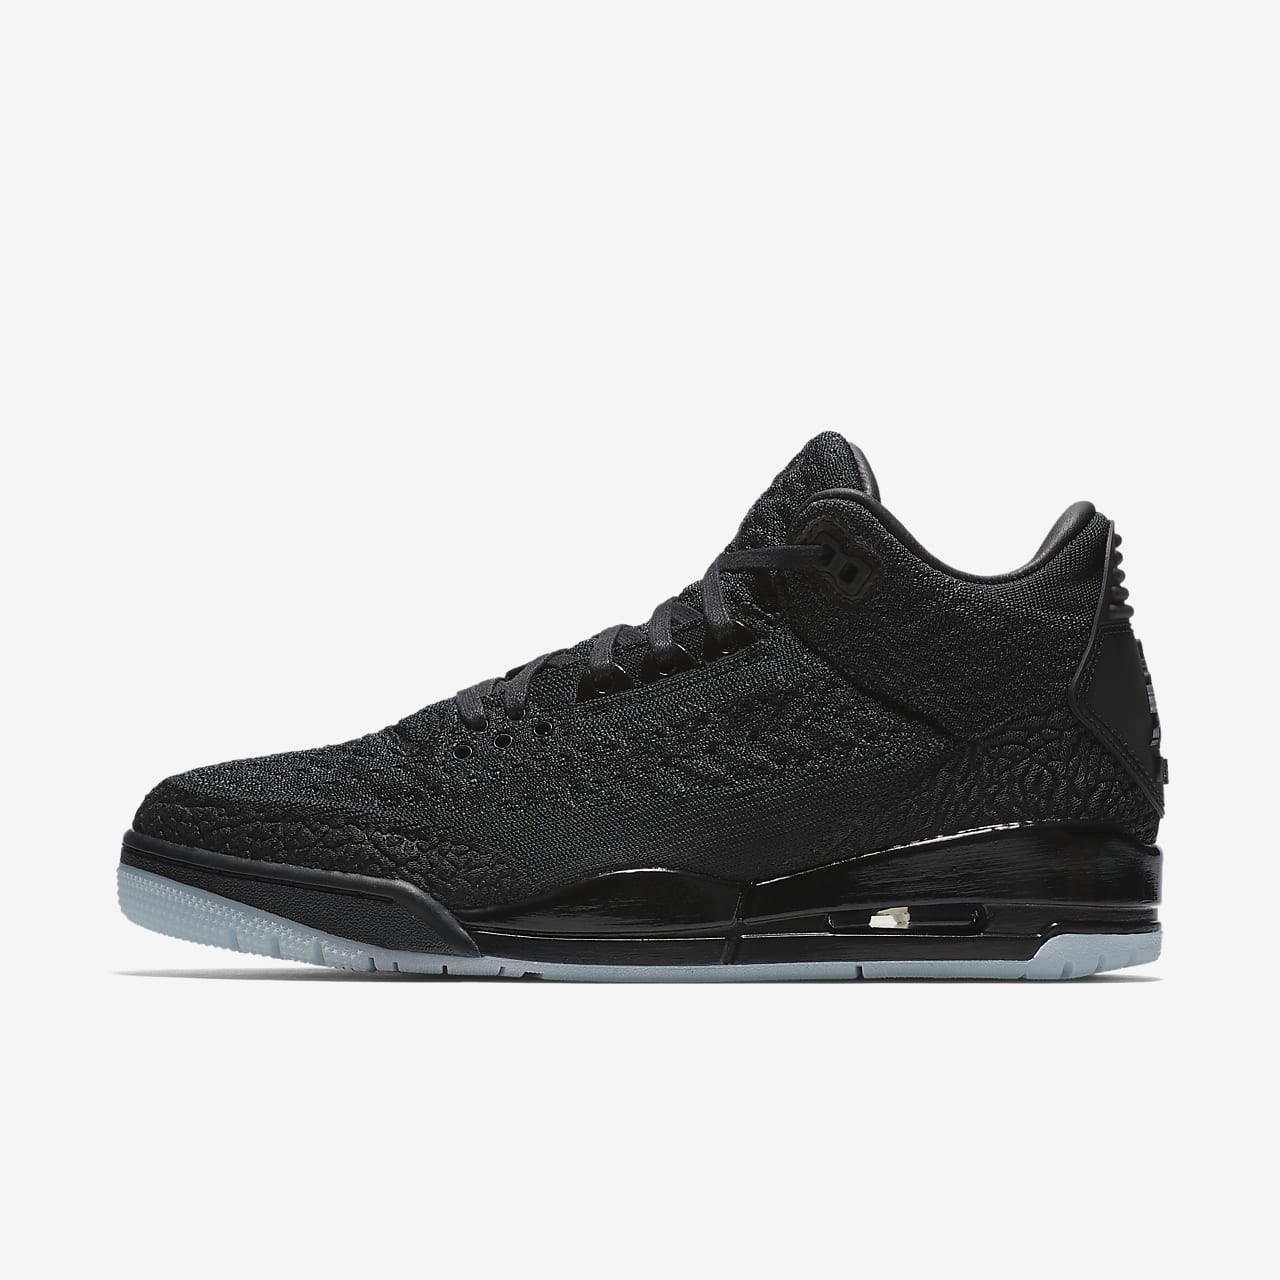 Air Jordan 3 Retro Flyknit Men's Shoe